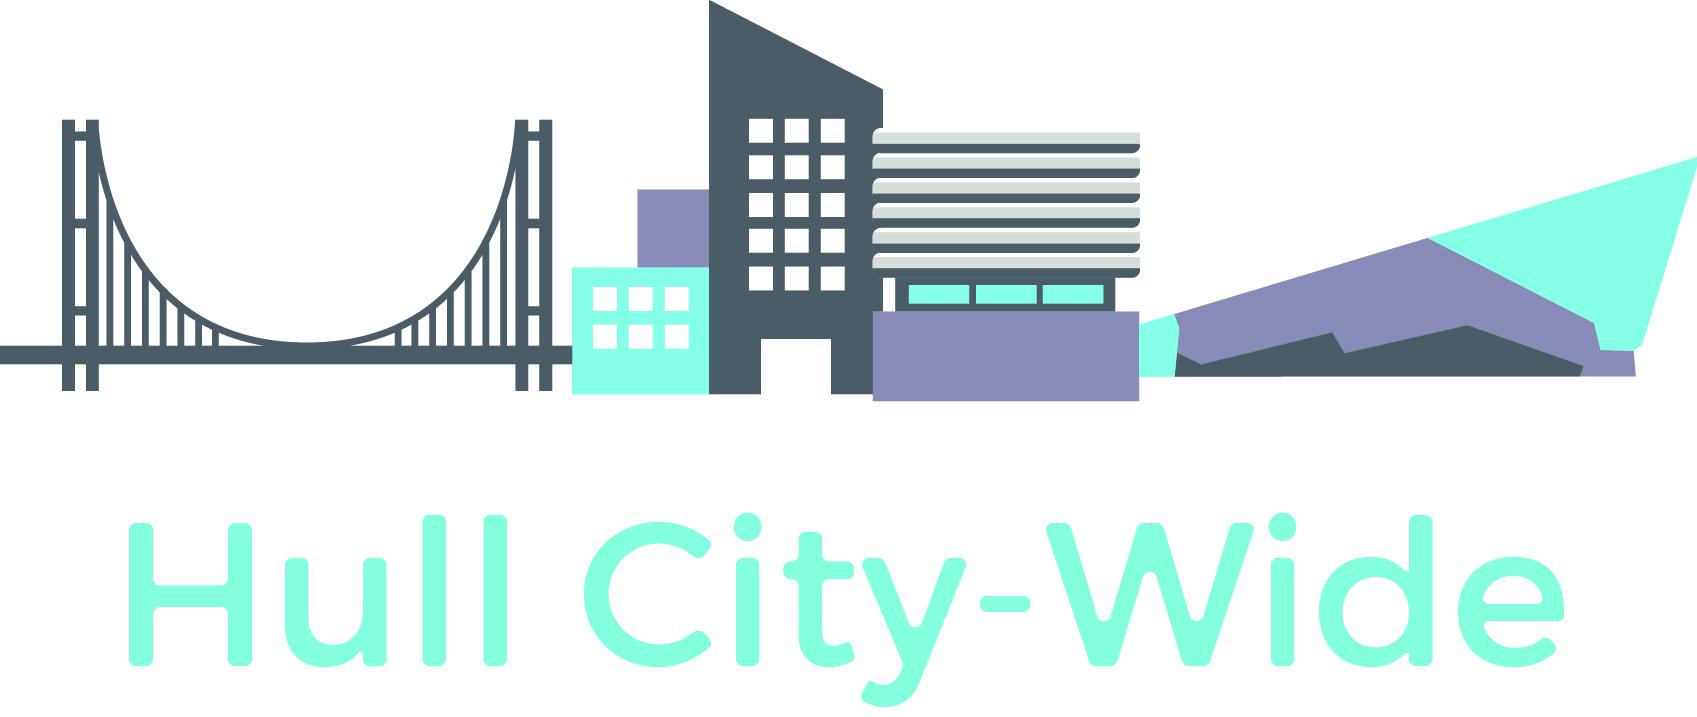 HCW-logo.jpg